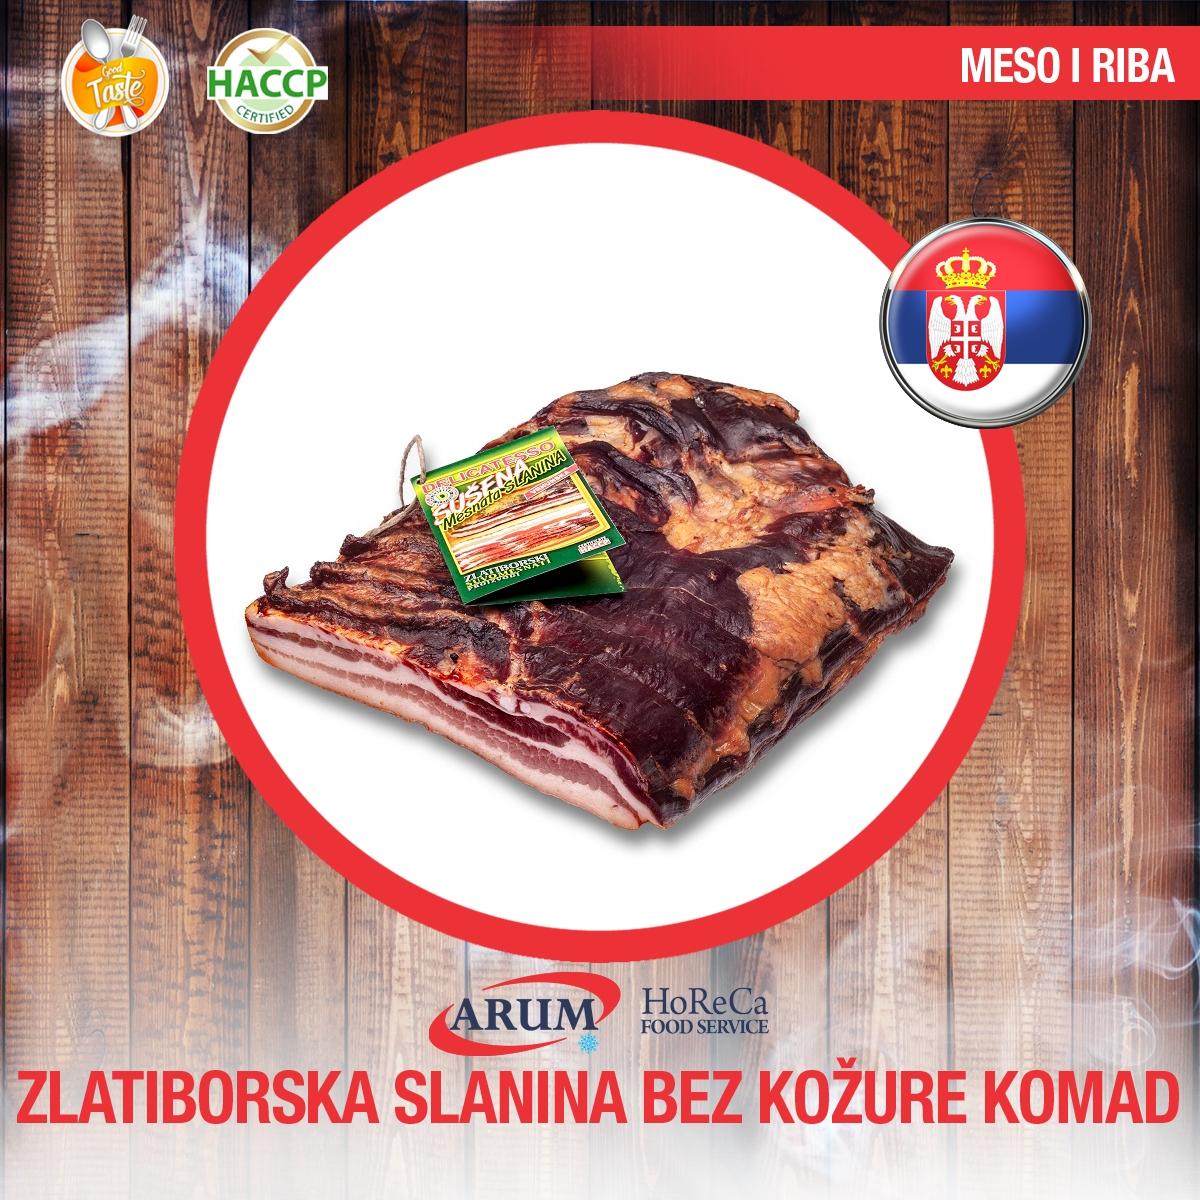 Zlatiborska slanina bez kozure komad